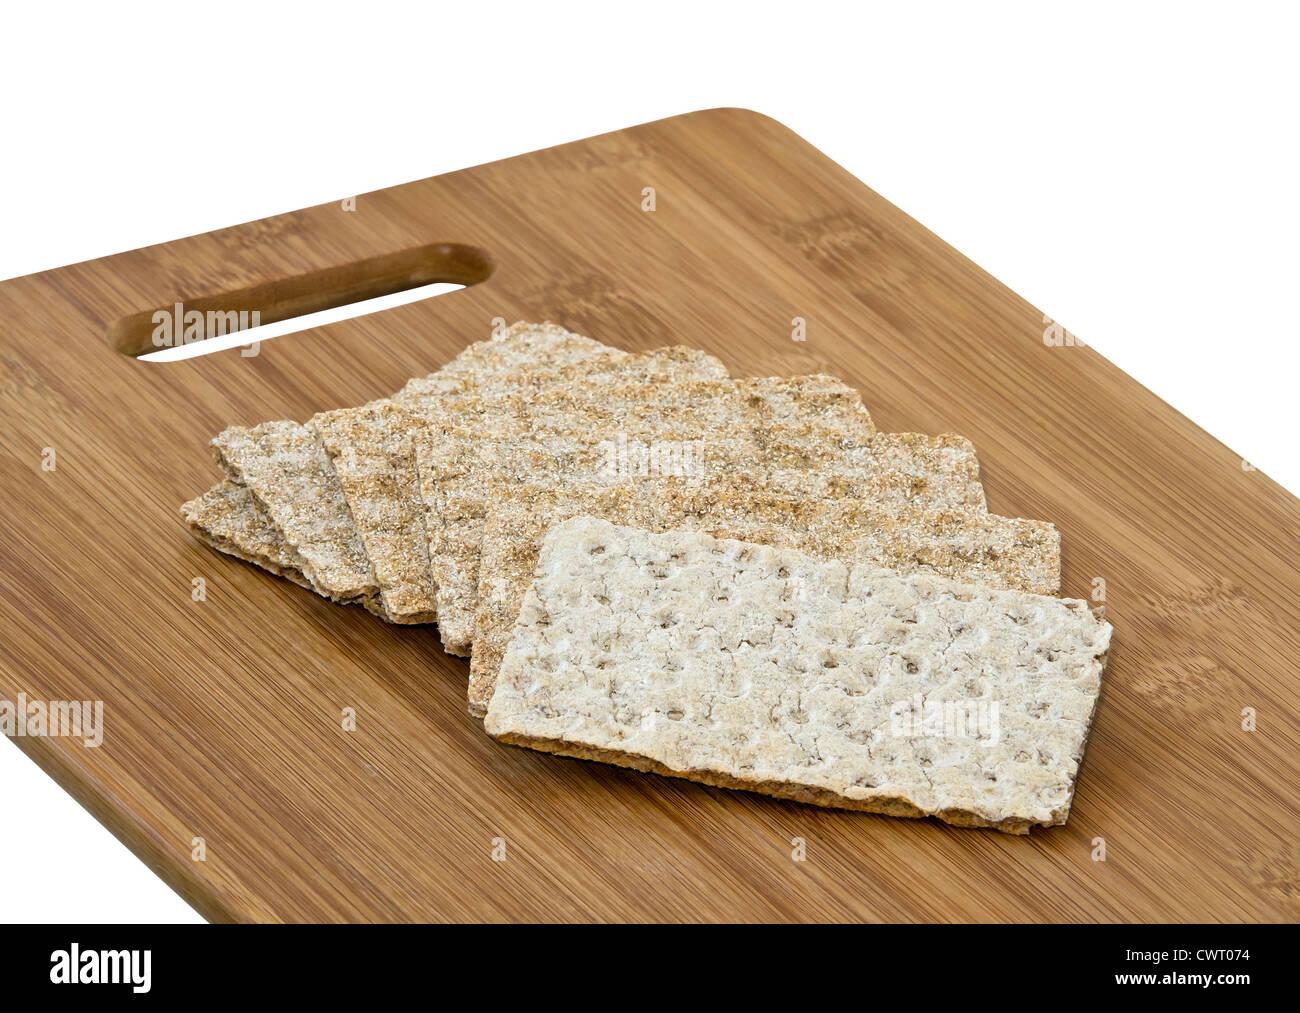 Crisp bread slices - Stock Image